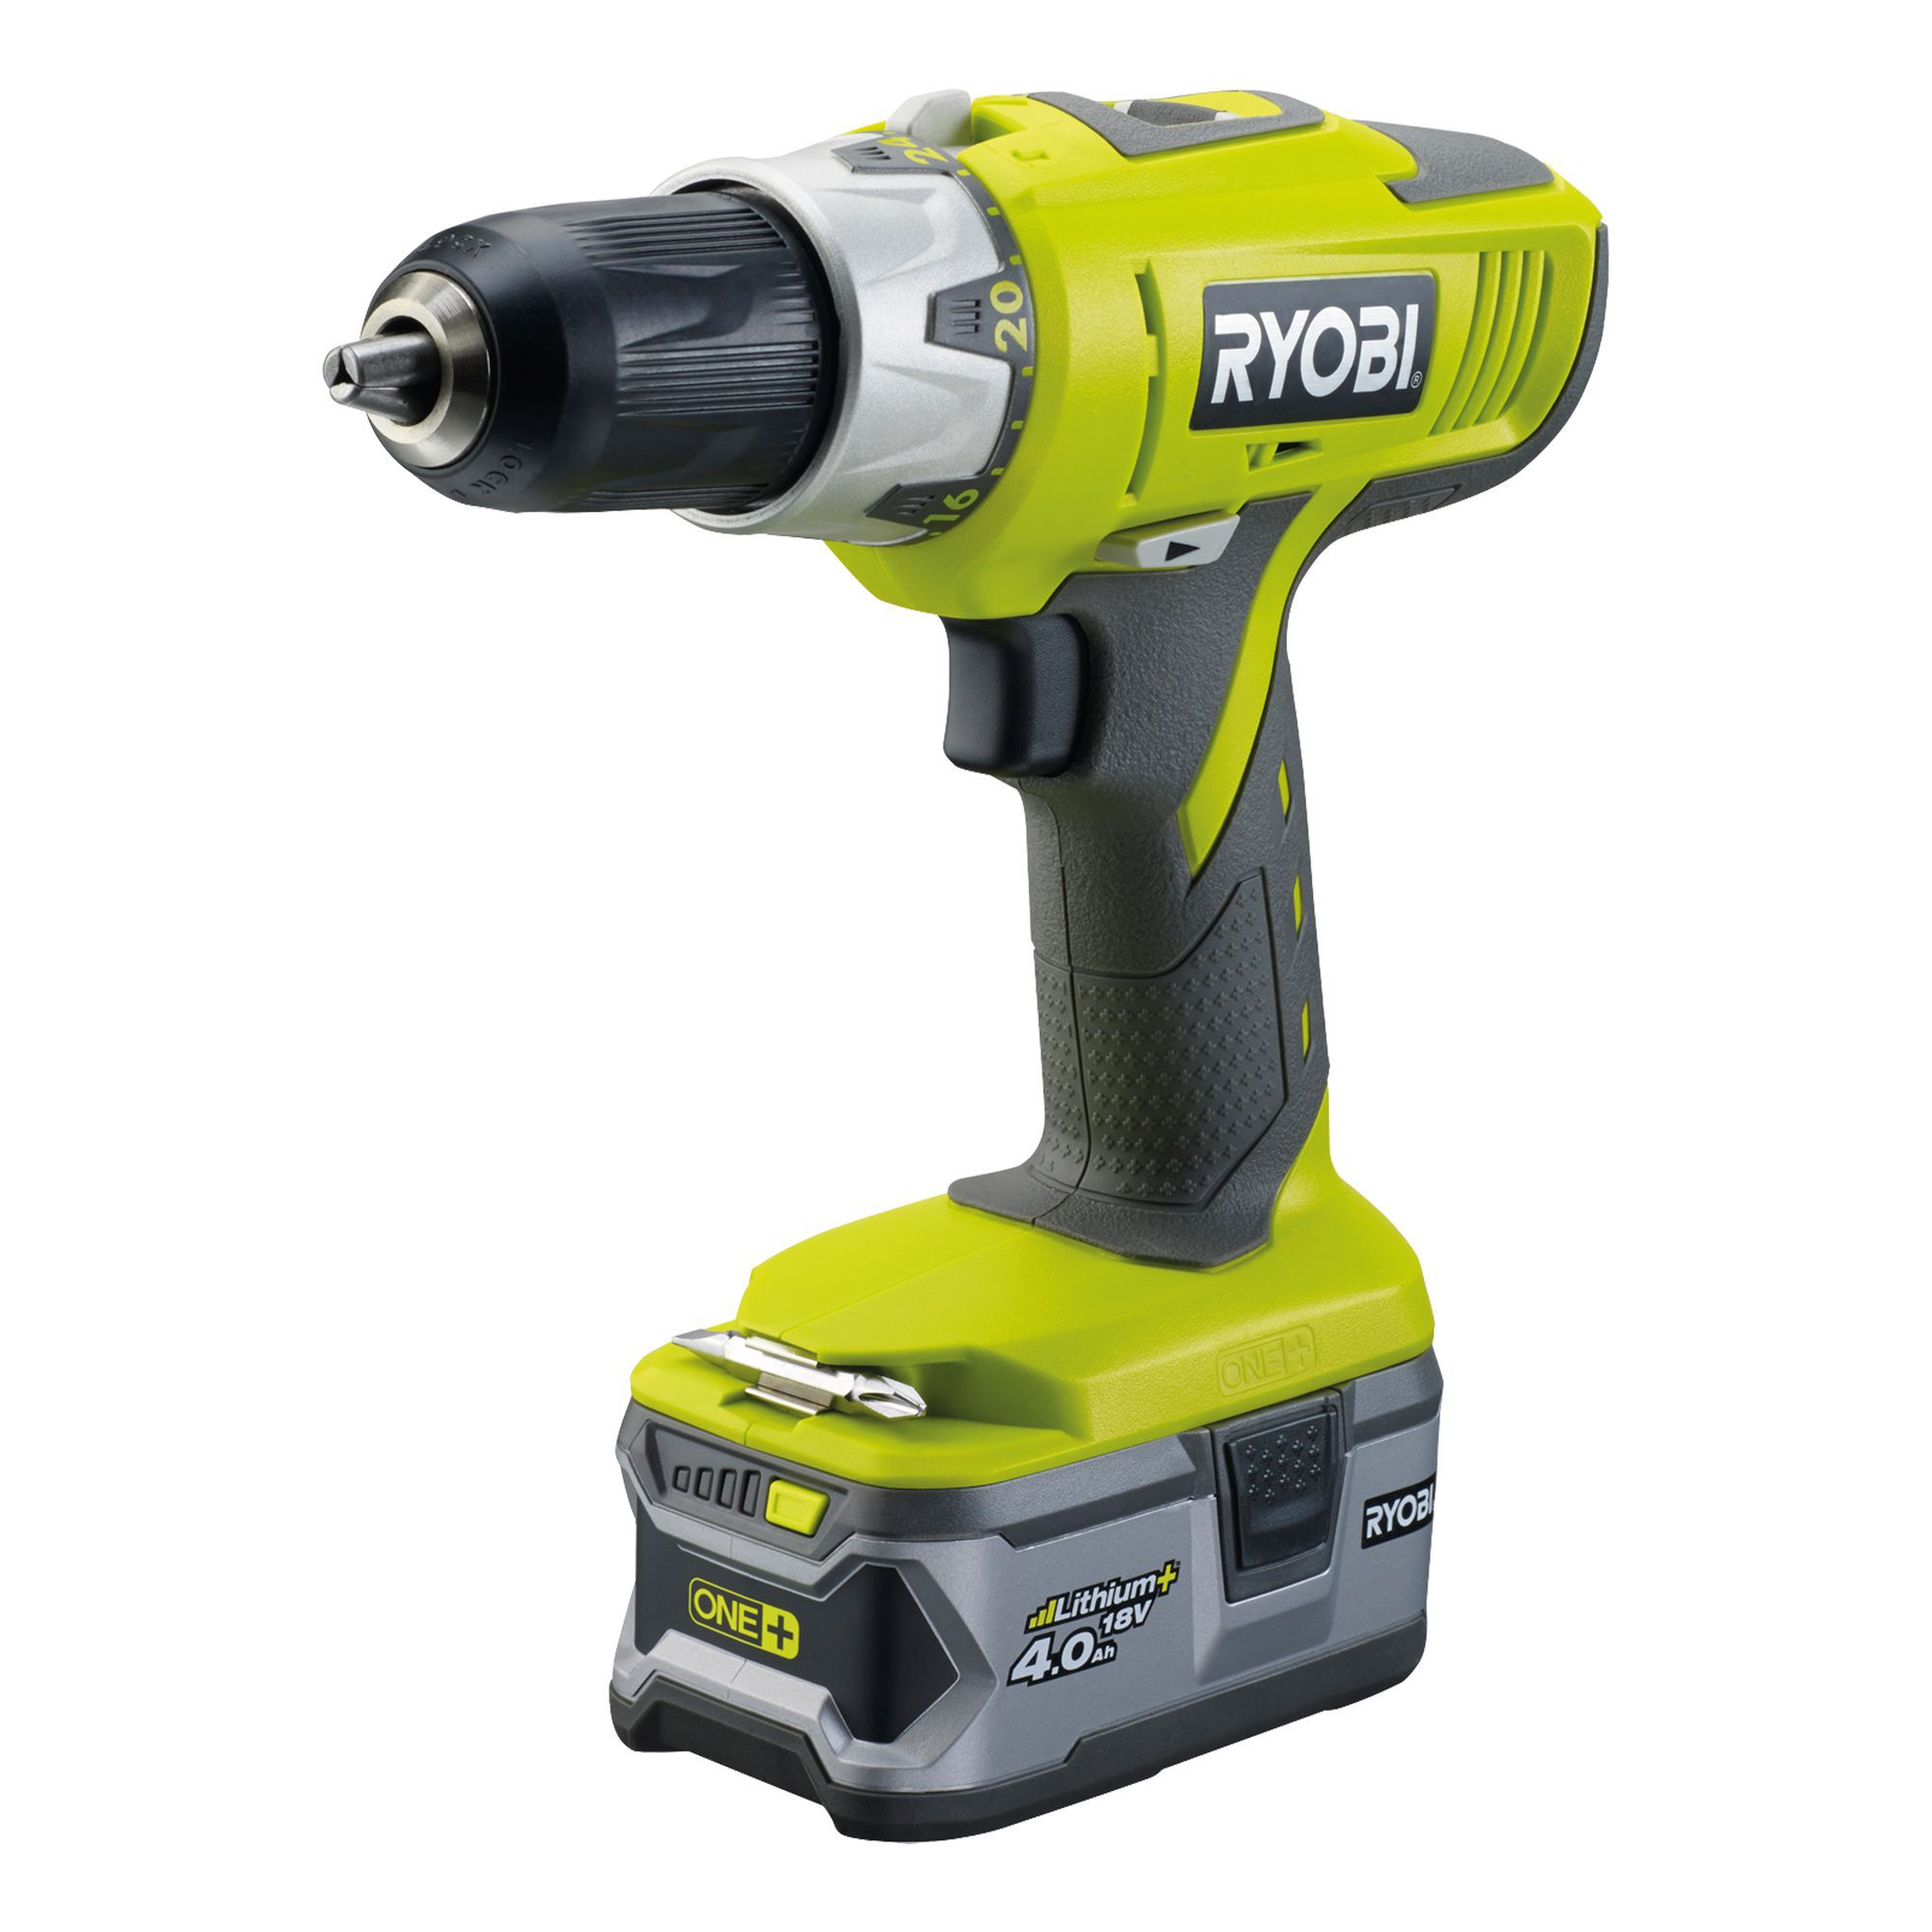 Ryobi One+ Cordless 18v 4ah Li-ion Combi Drill 2 Batteries Llcdi18ll40s